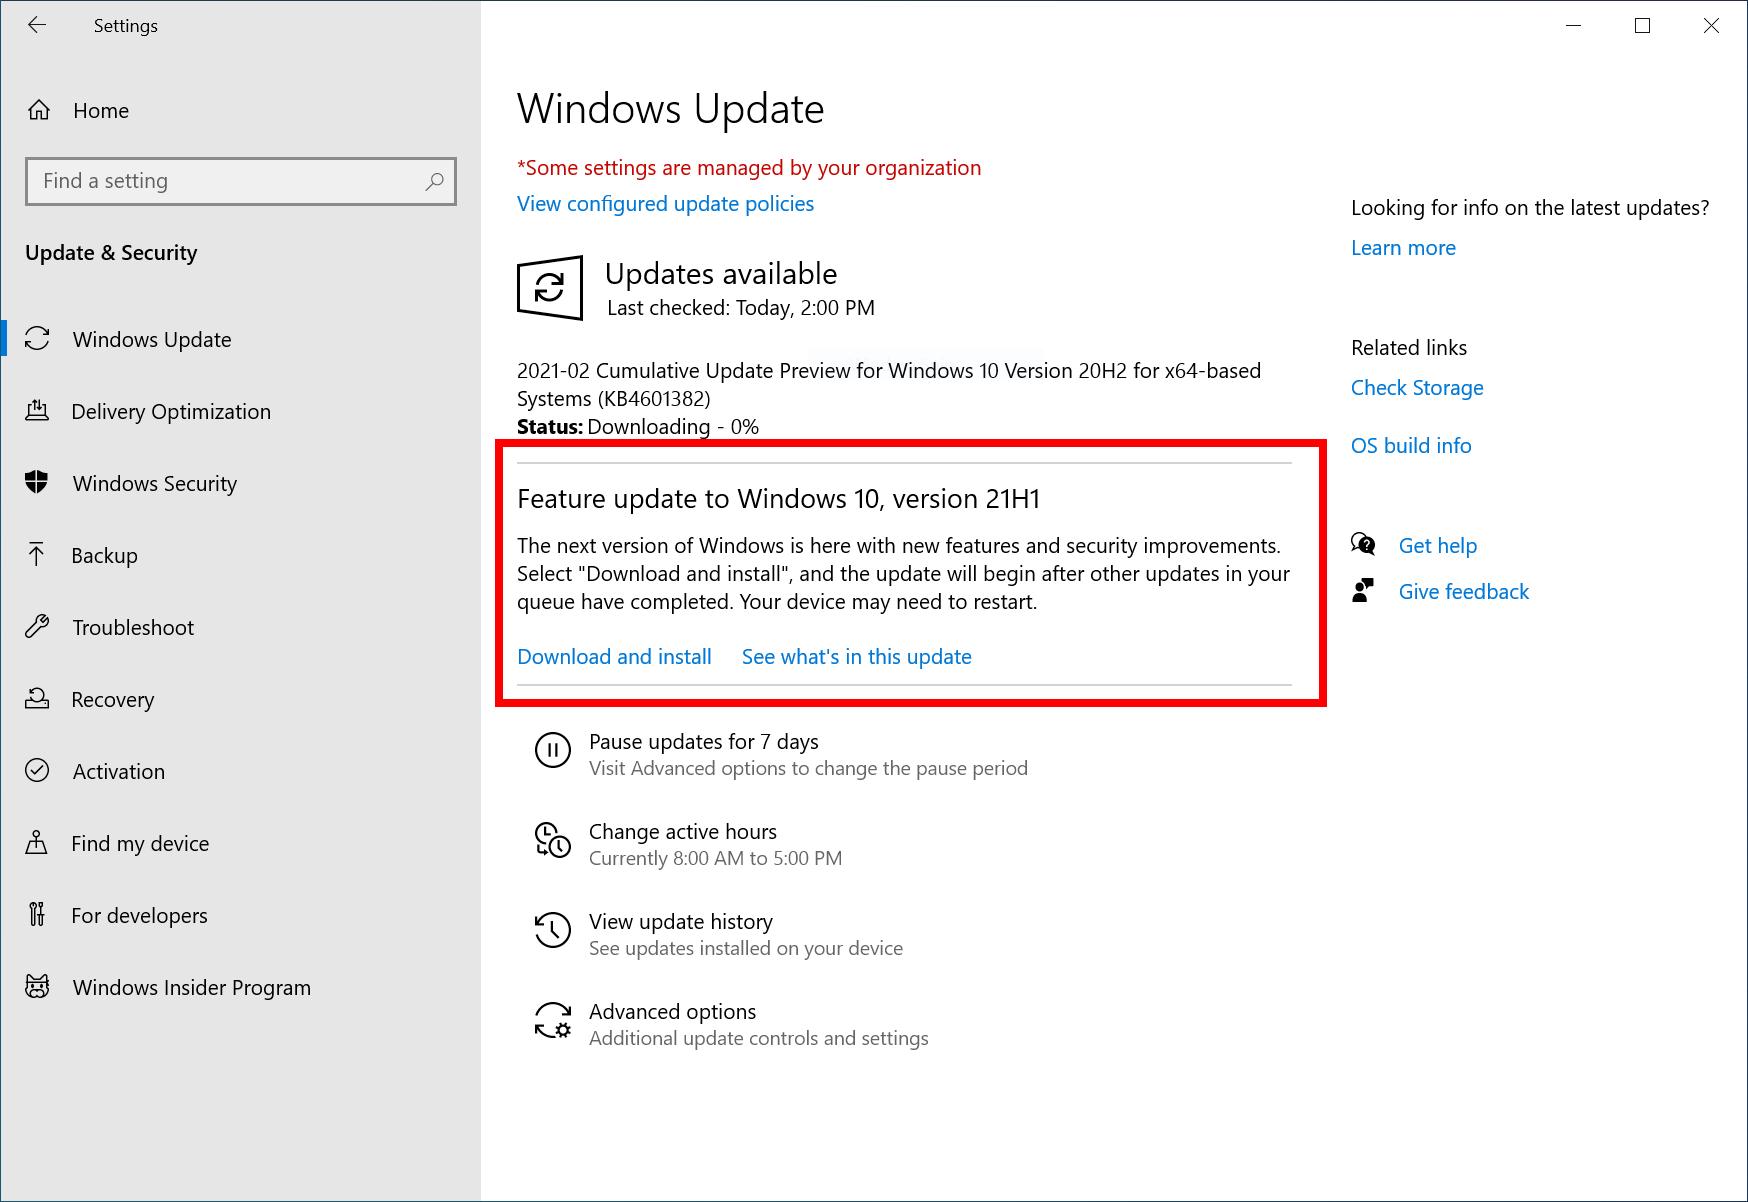 Win10 Build 19043.899发布:经典版Edge浏览器被移除的照片 - 2